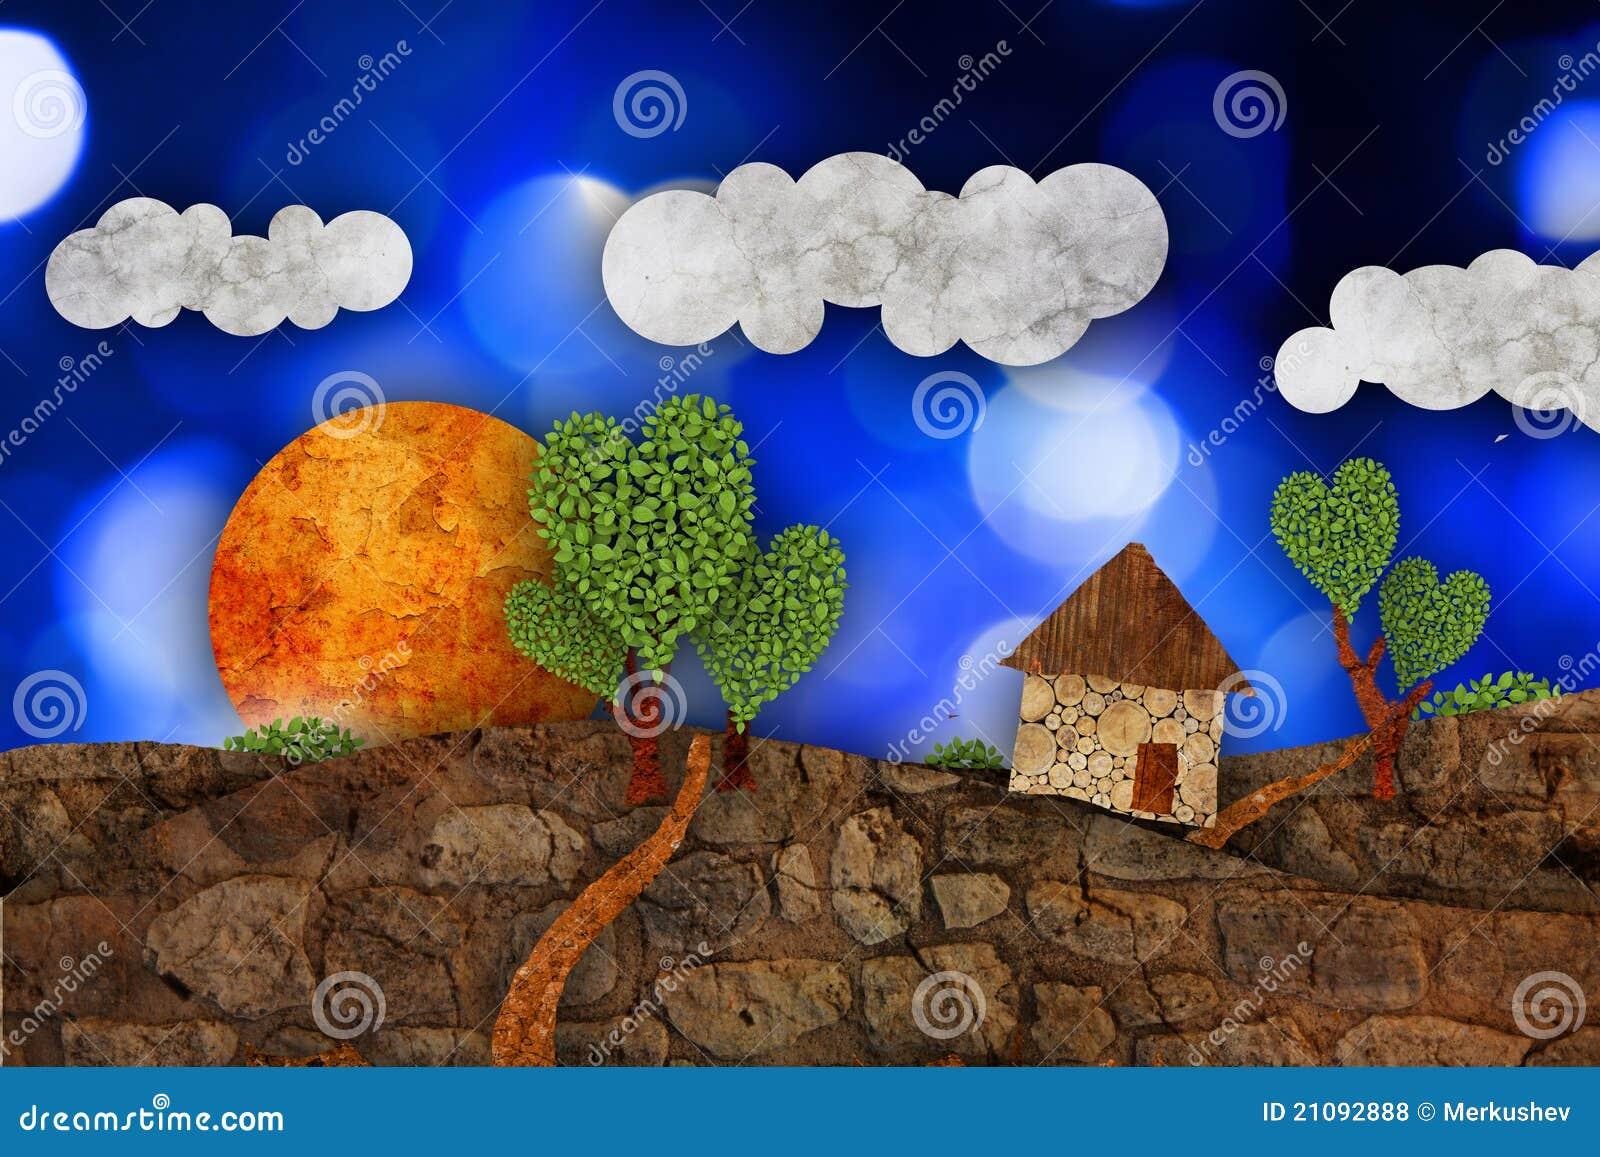 Suburban landscape with house, illustration